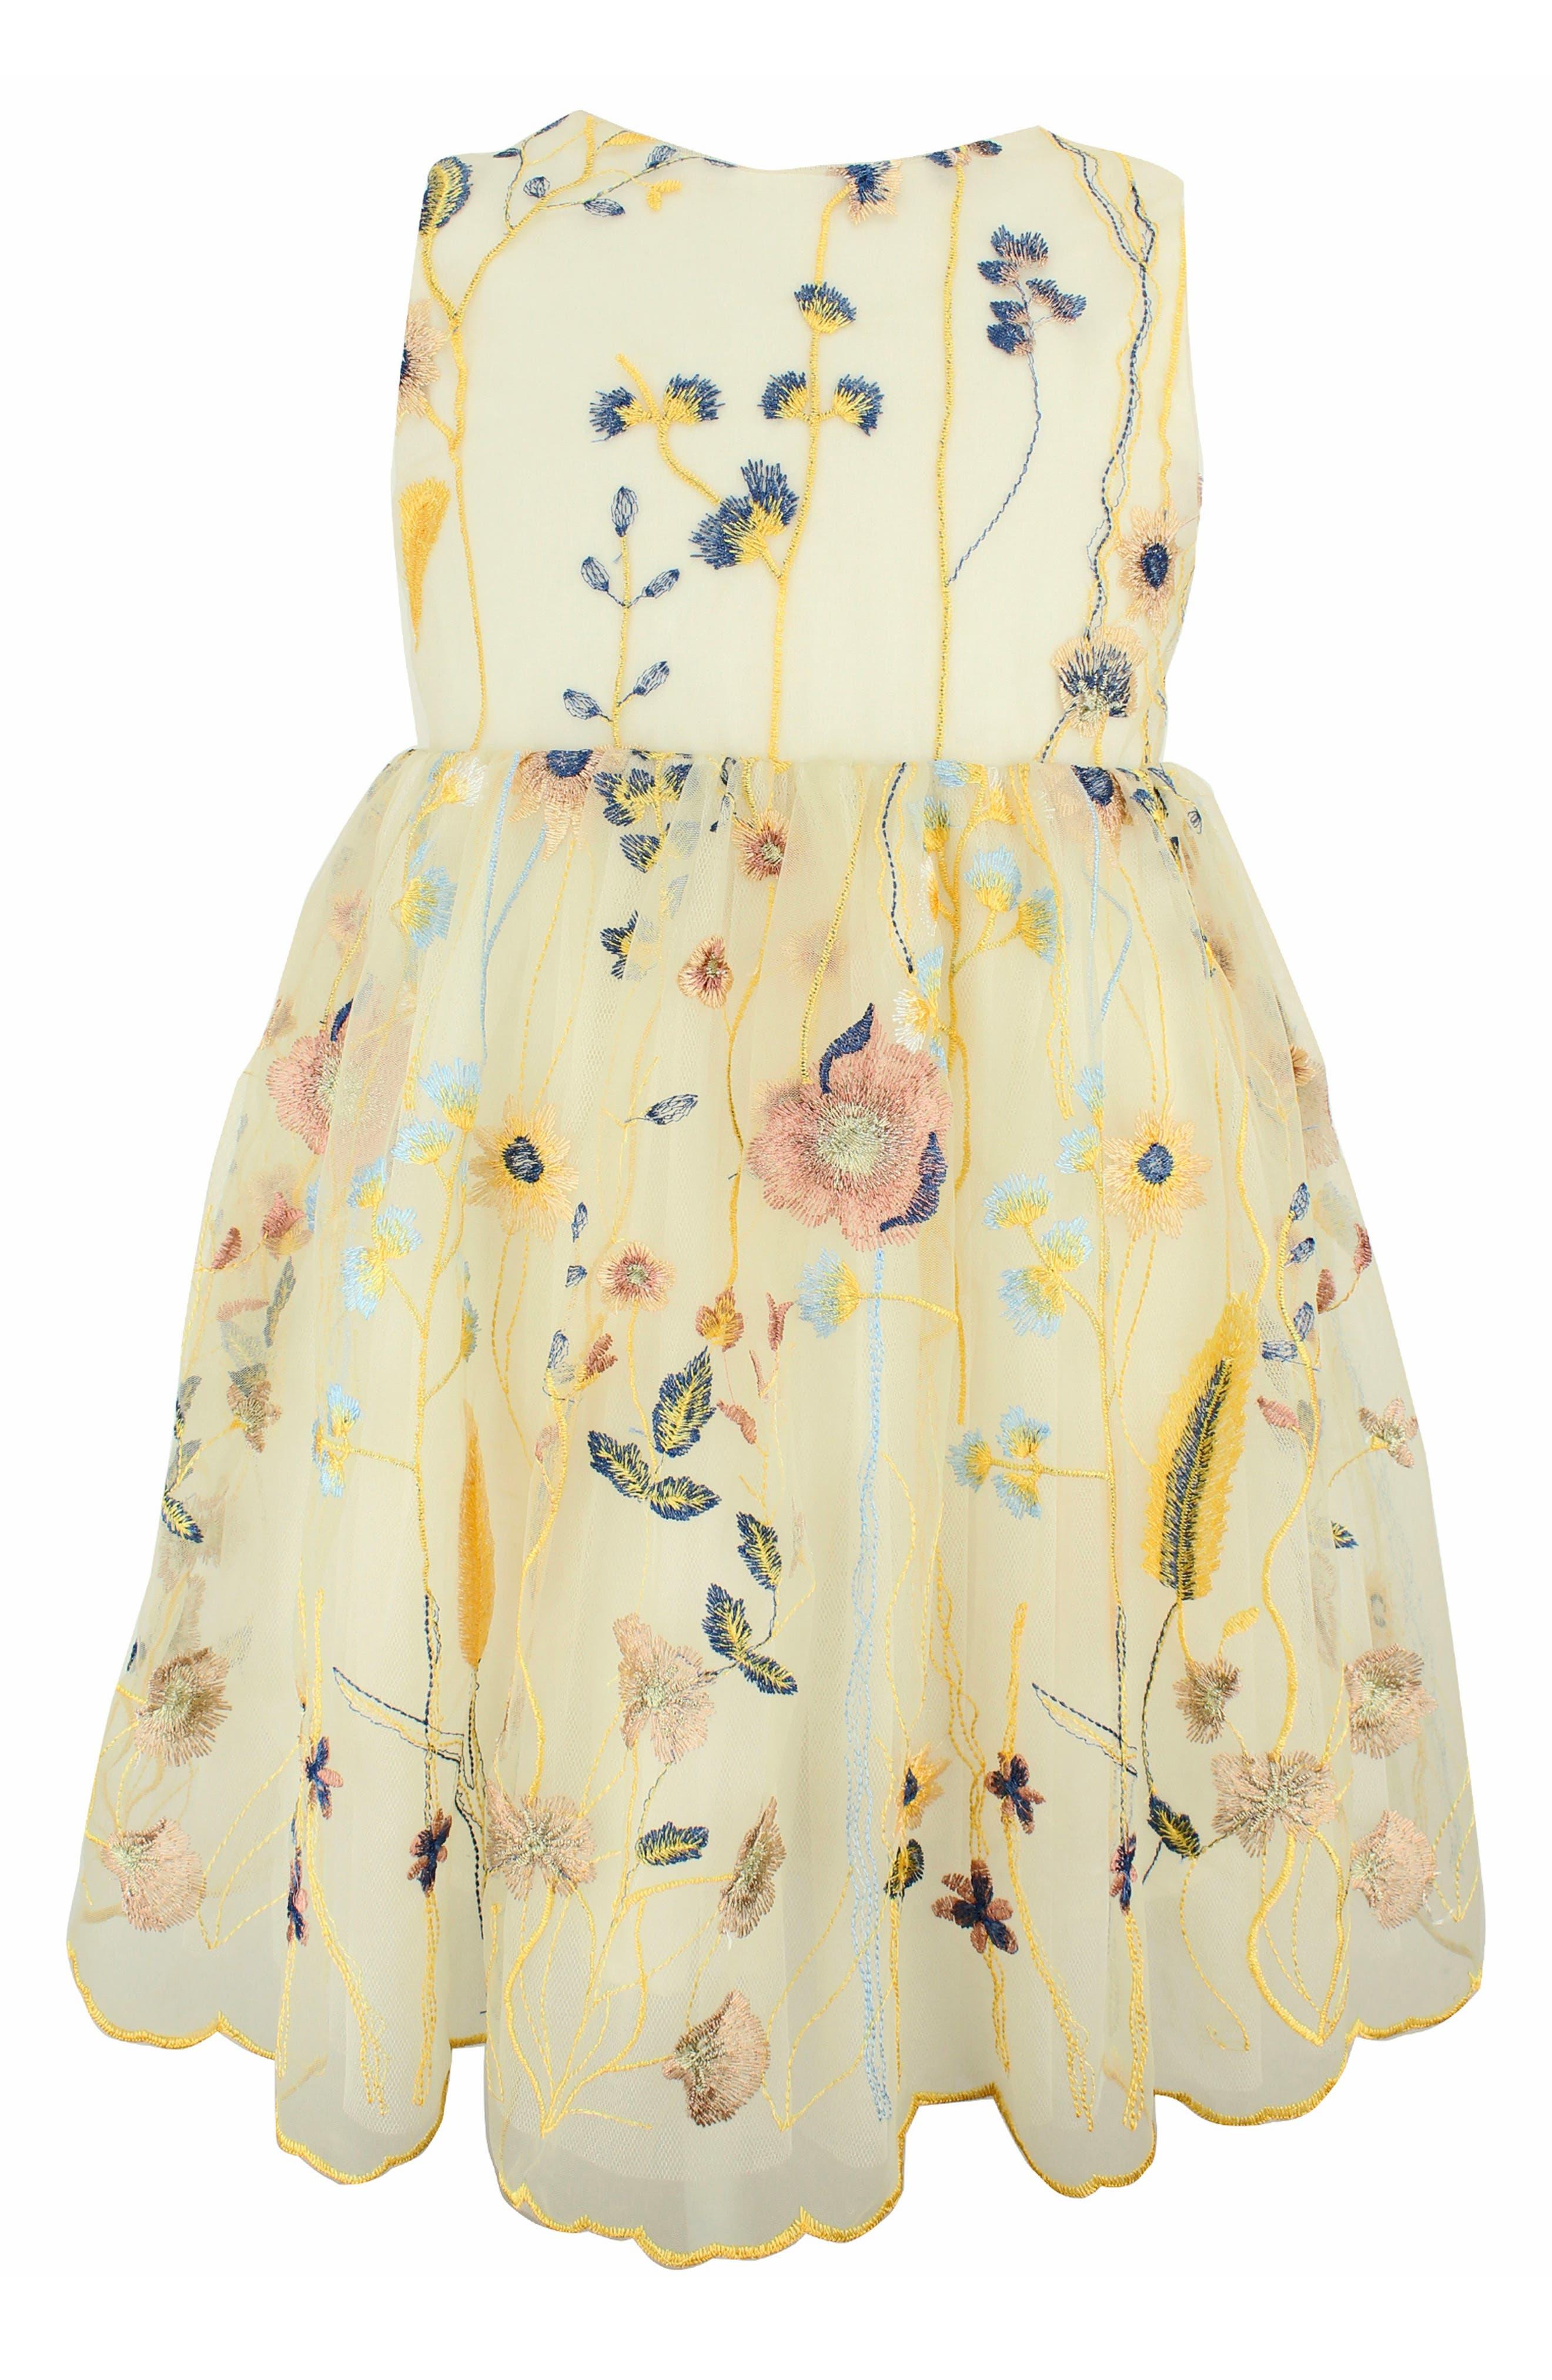 POPATU, Embroidered Tulle Dress, Main thumbnail 1, color, CREAM